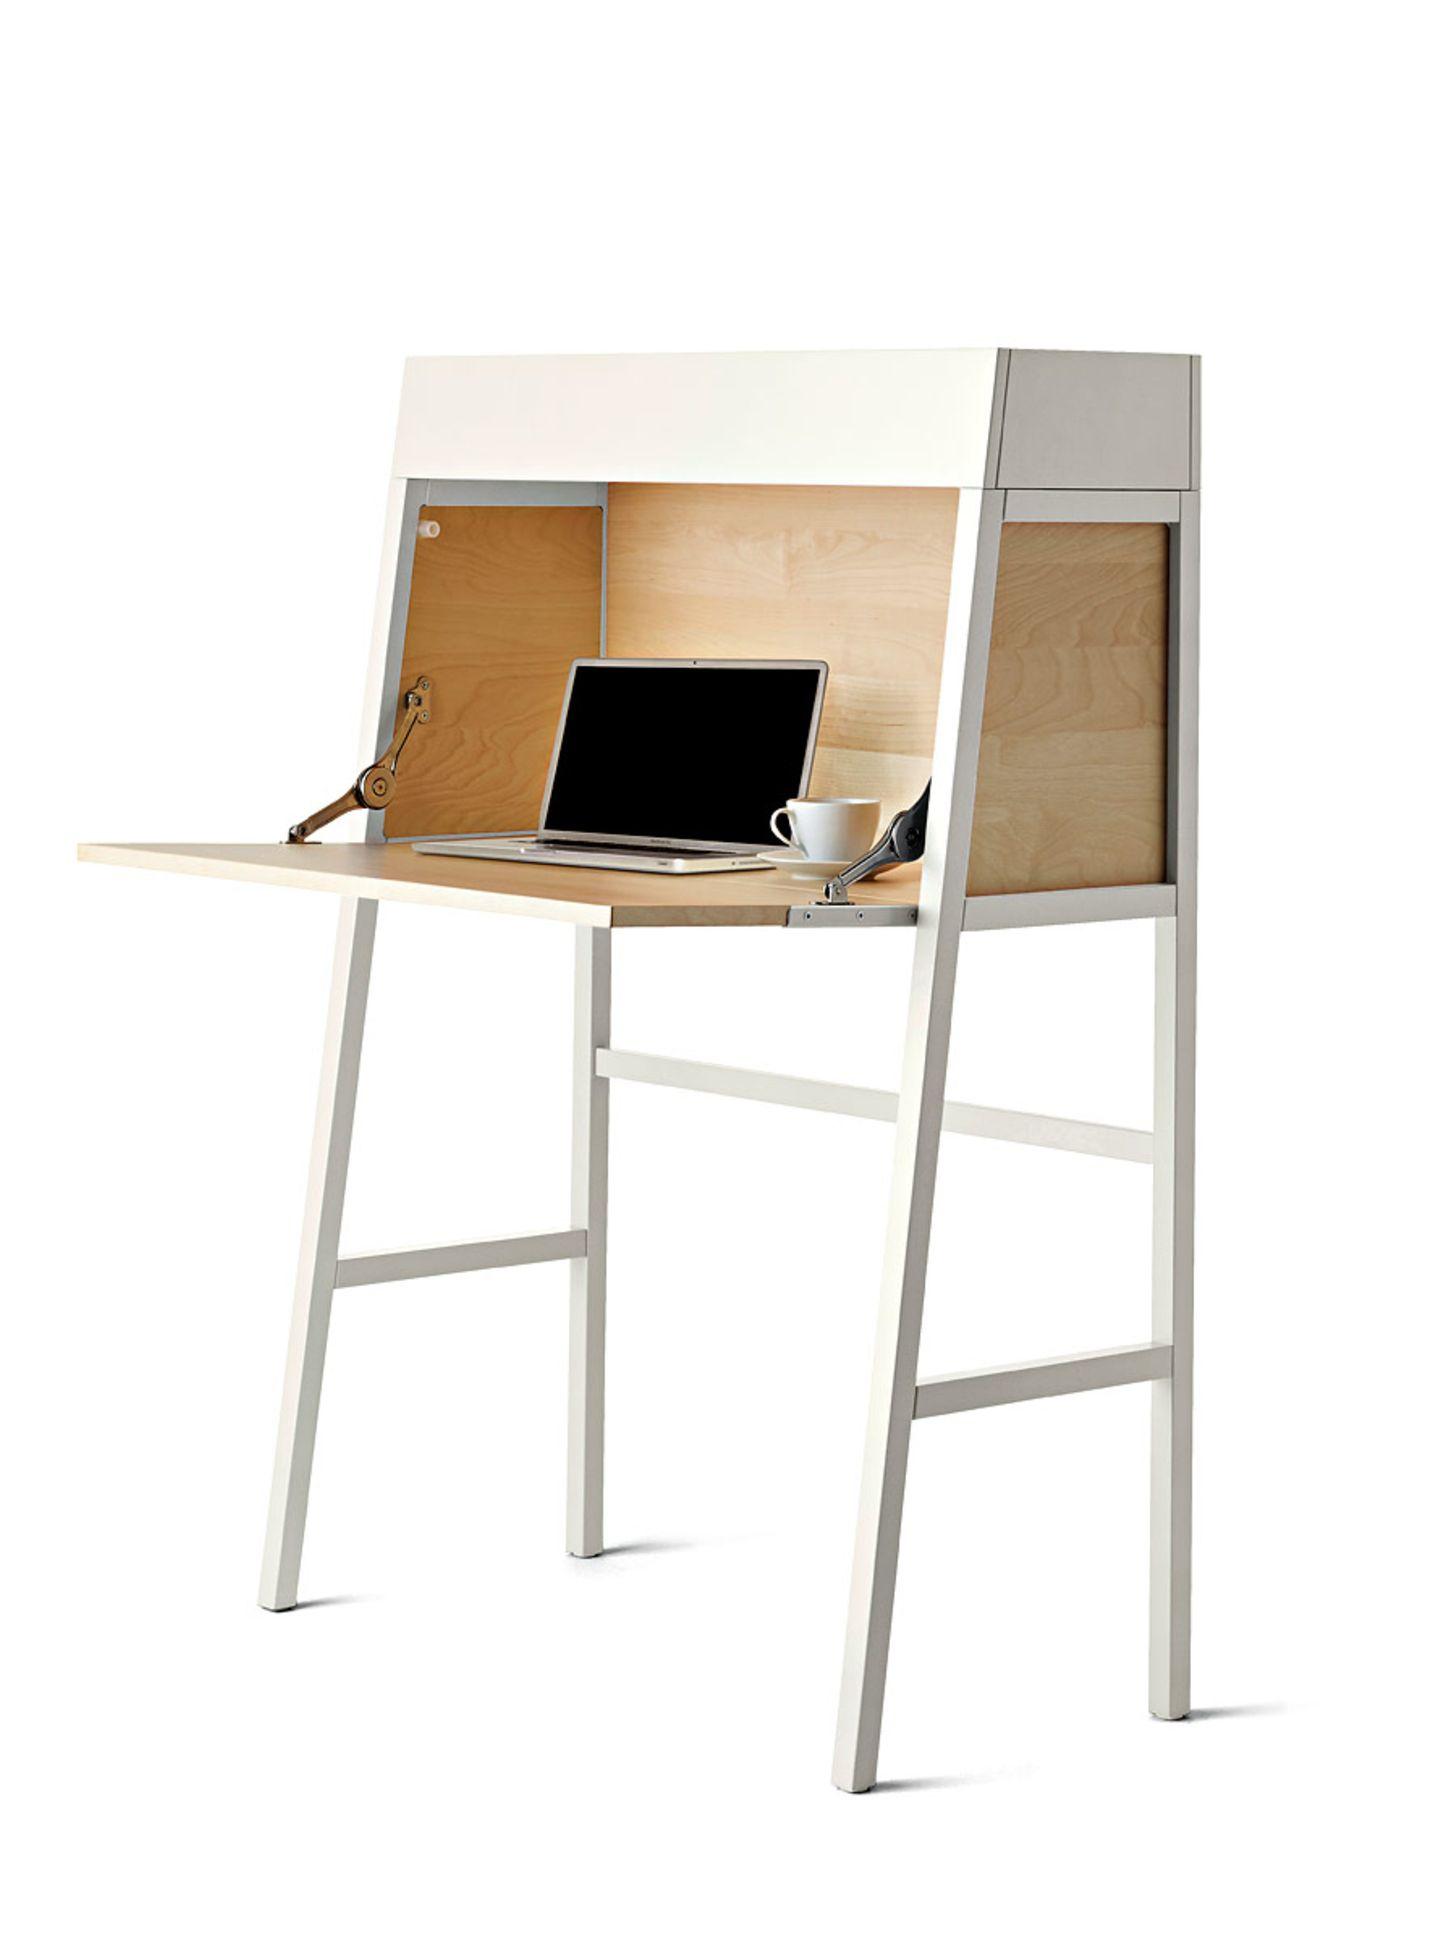 "Sekretär ""PS"" von Ikea - Bild 37"